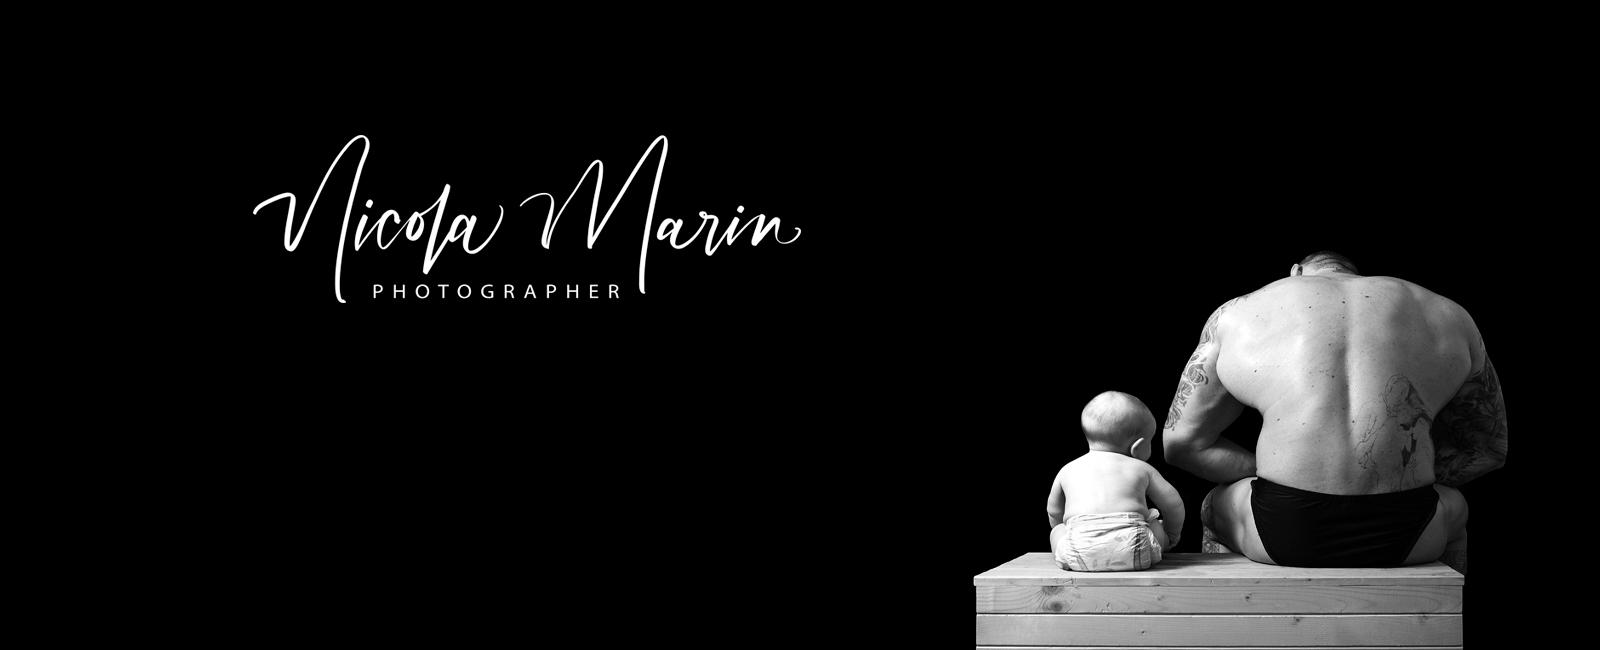 Photographer Nicola Marin